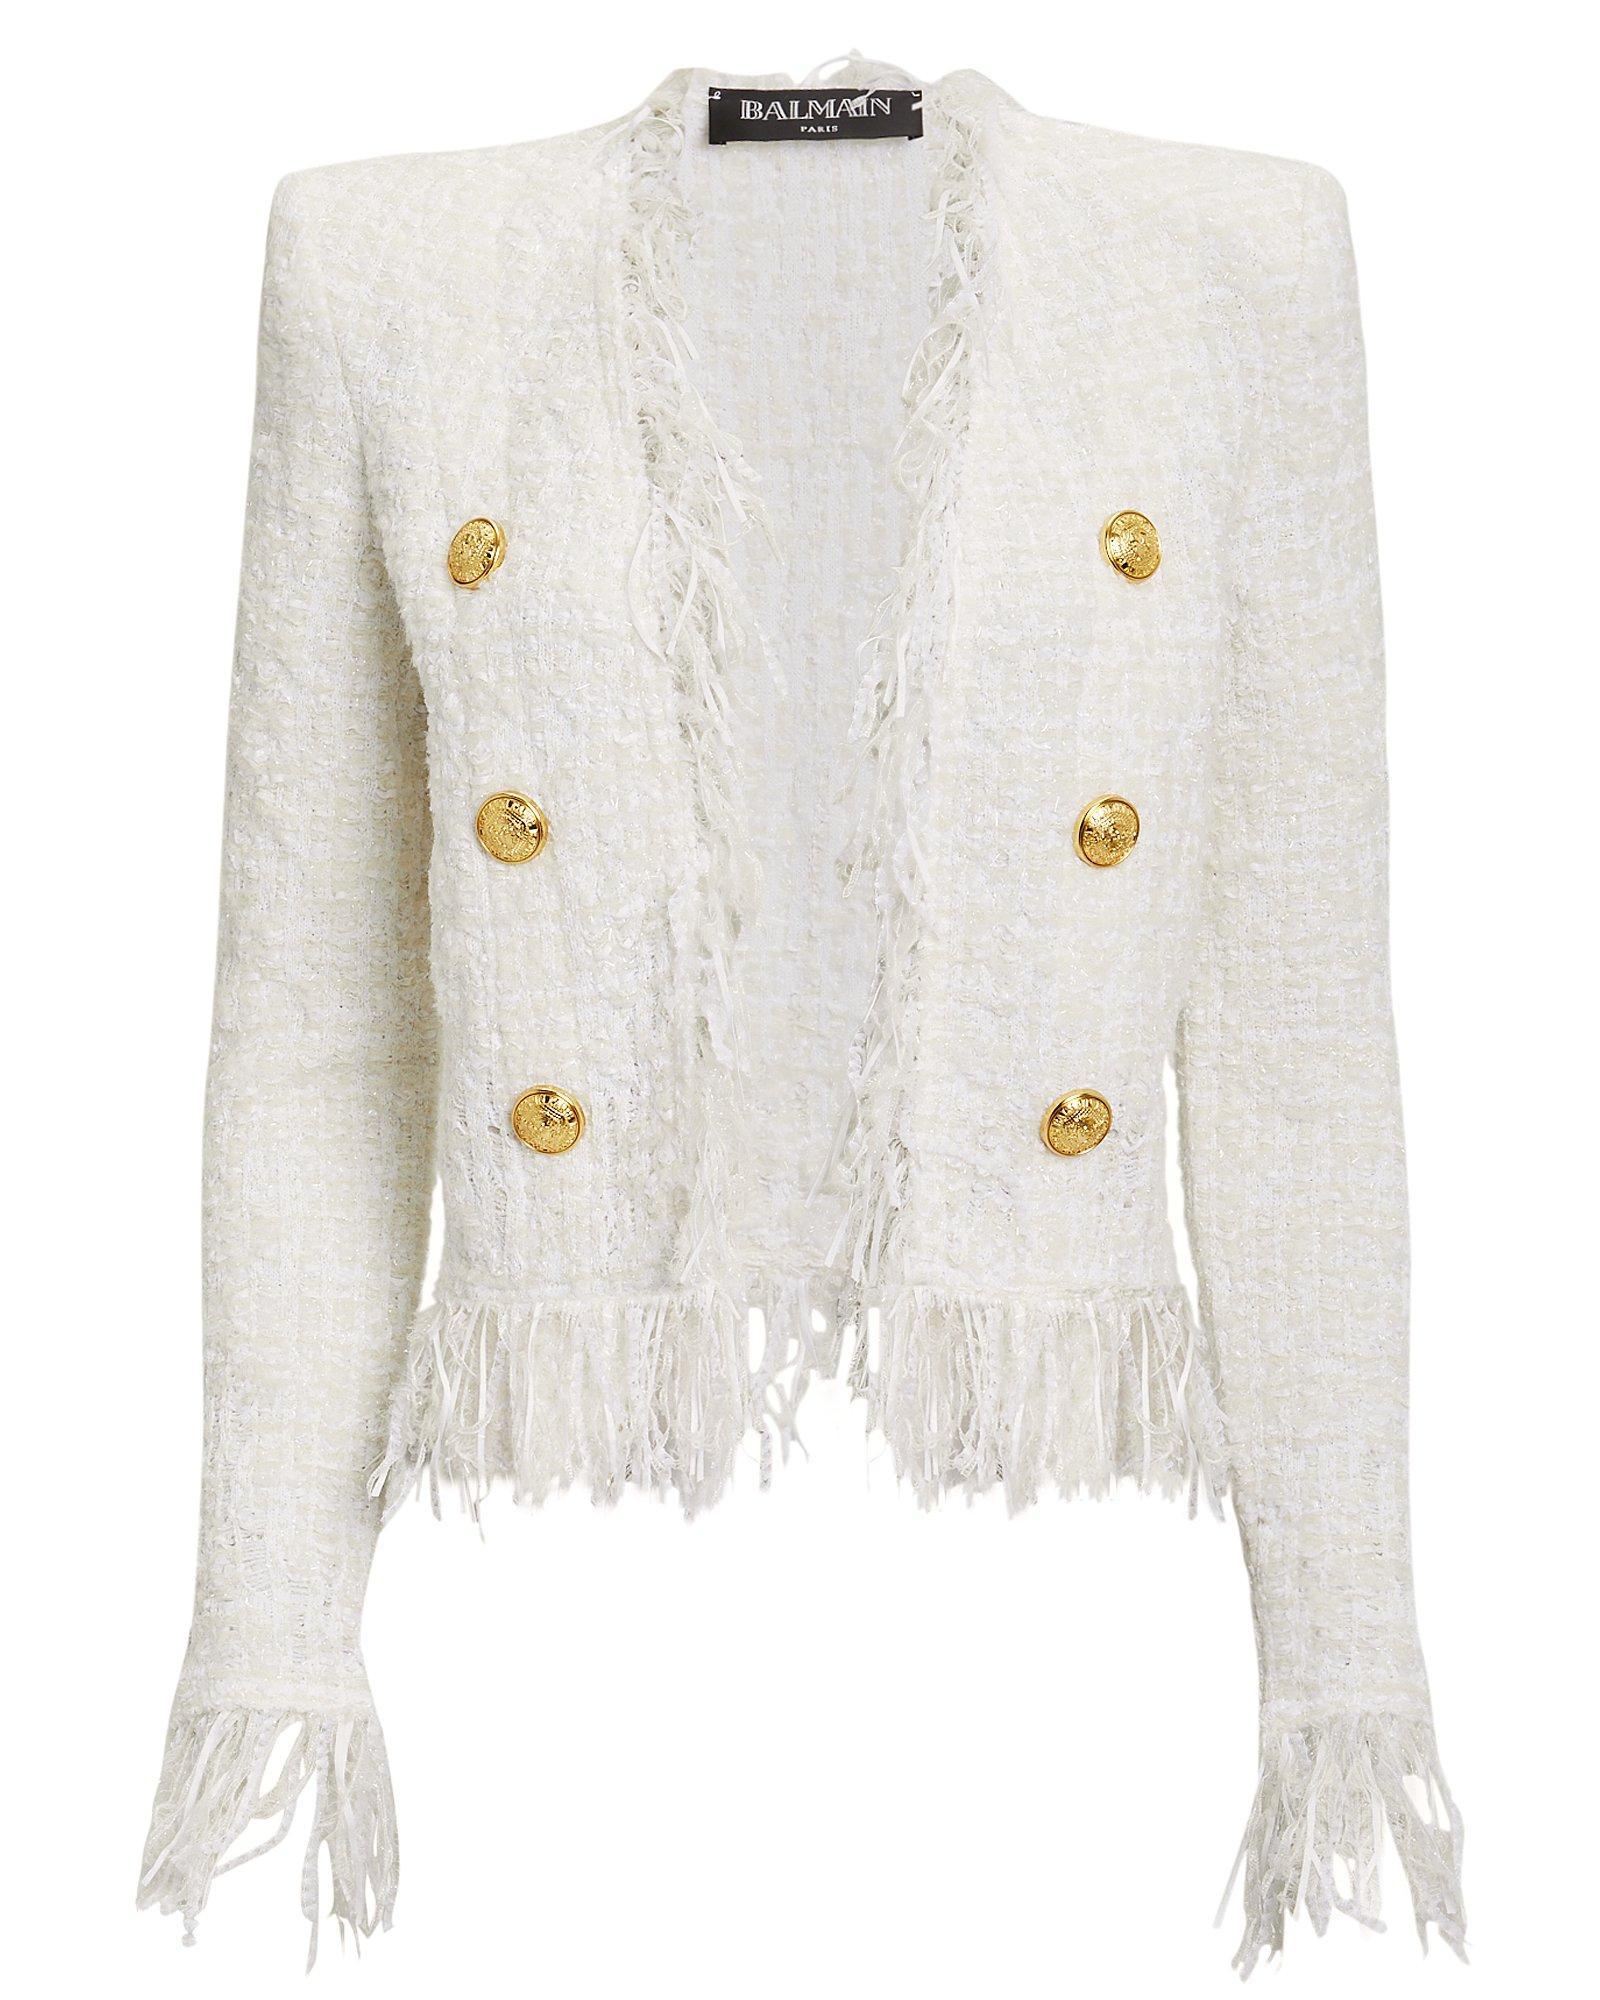 dd9d1e02f7c Balmain - White Tweed Fringe Jacket - Lyst. View fullscreen